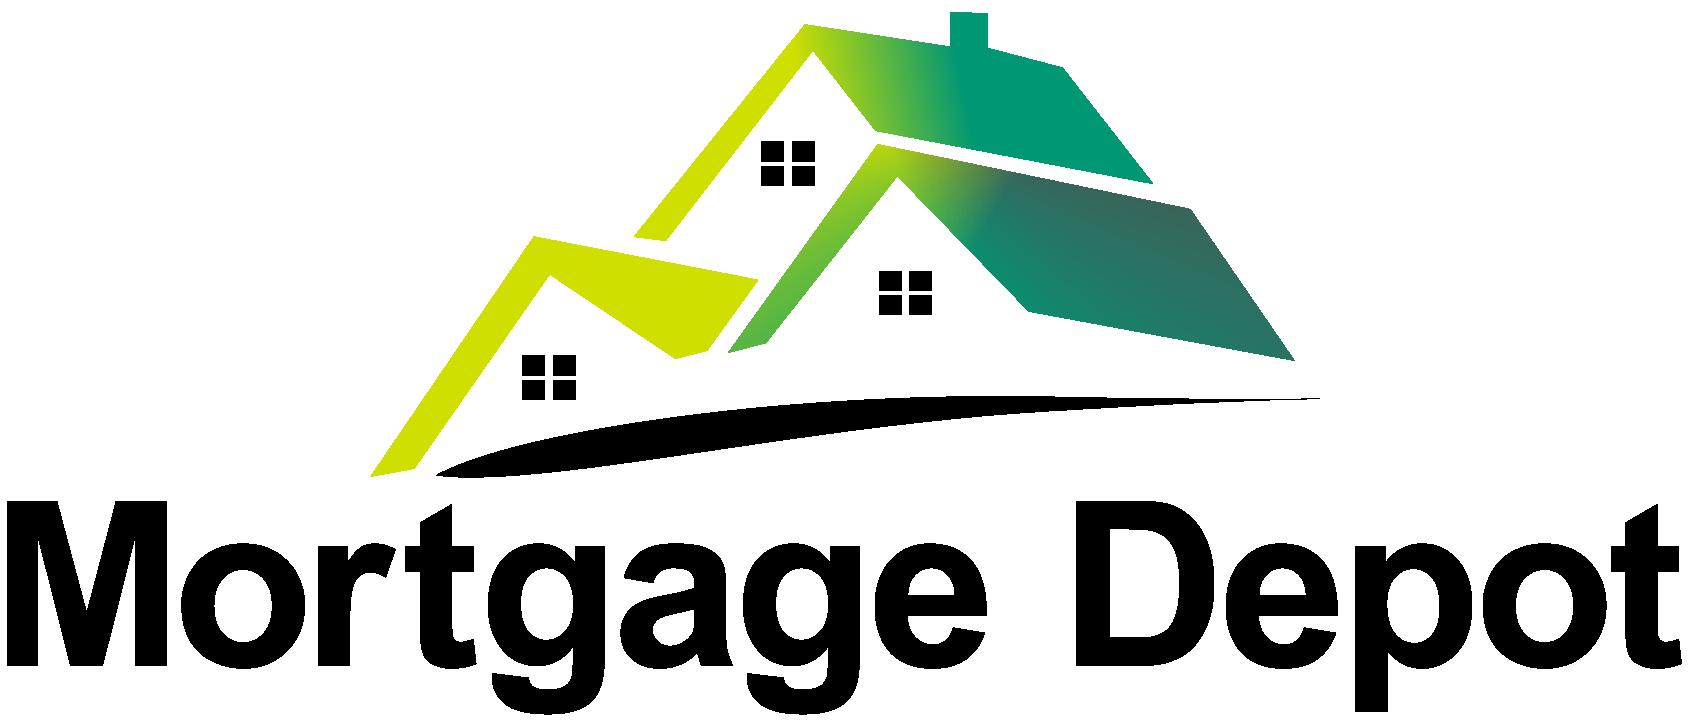 Mortgage Rates Loan Depot